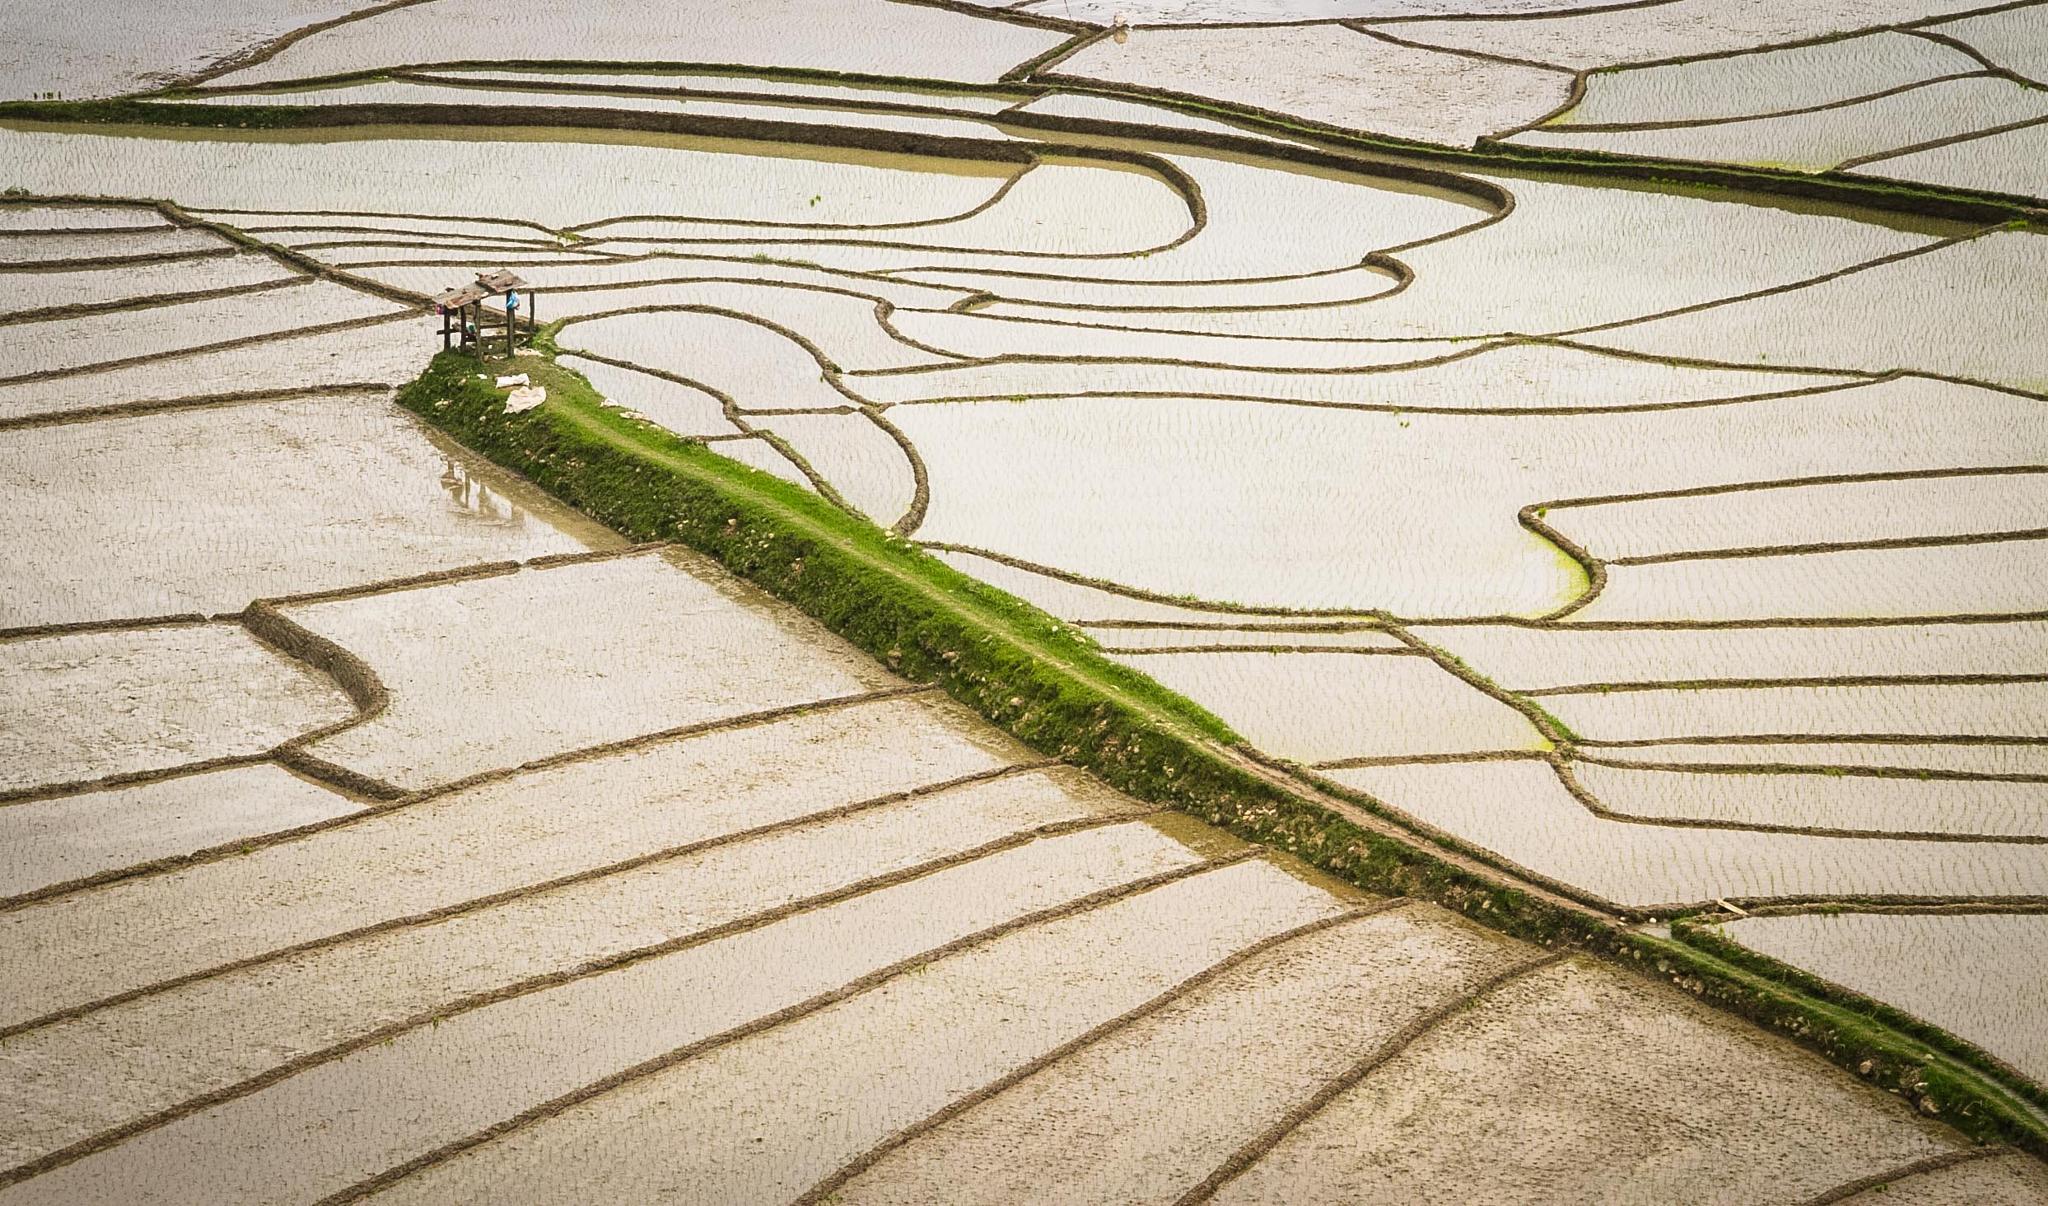 Rice farm by AminDogoonchi